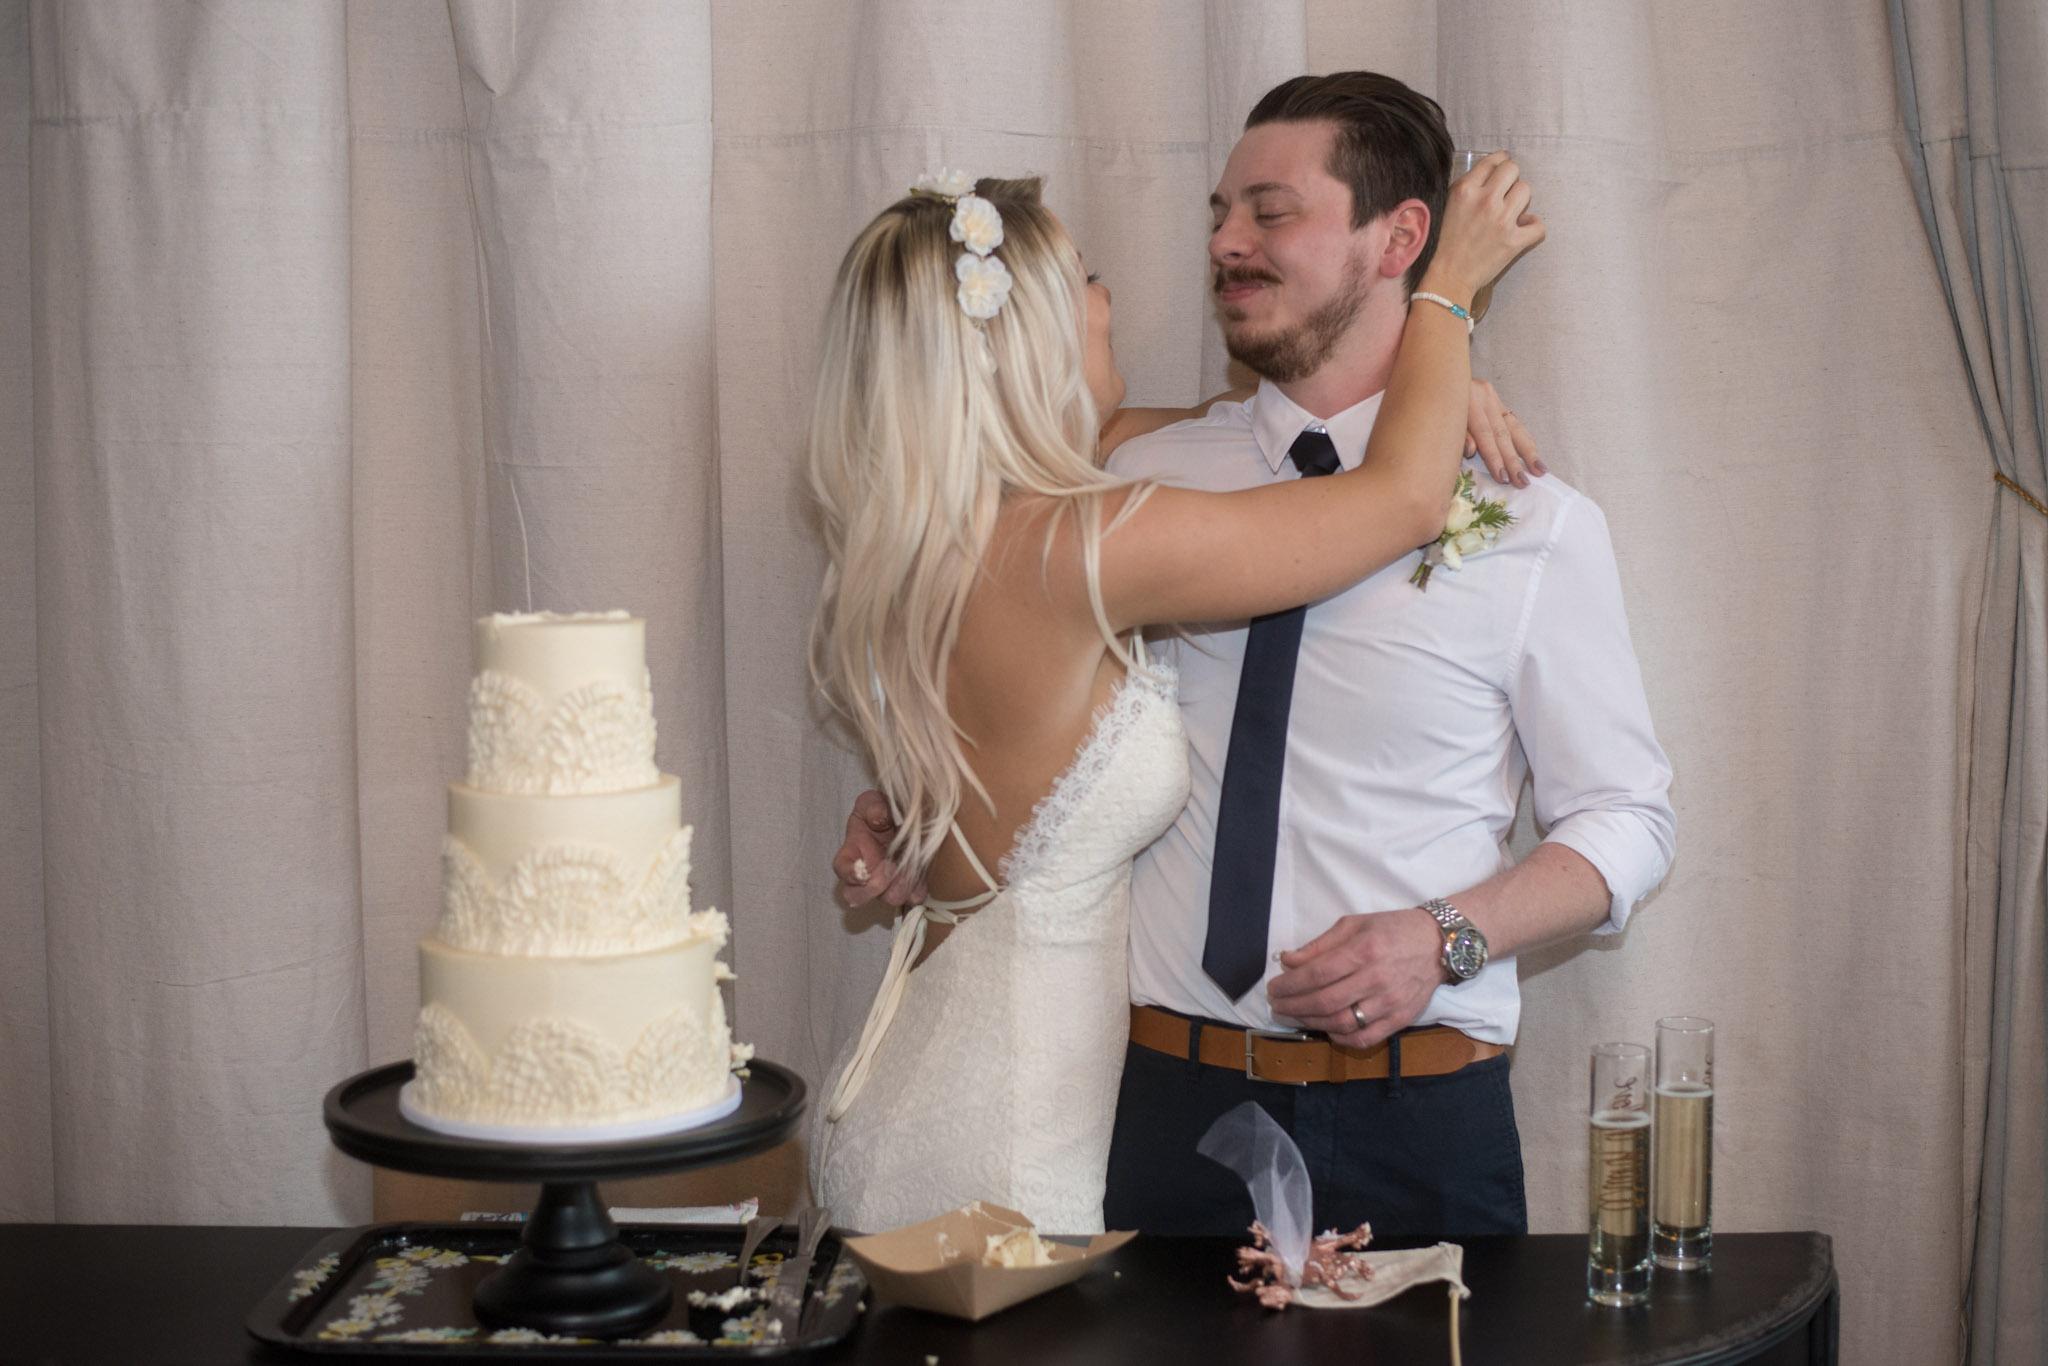 Kansas_City_Intimate_Small_Budget_Wedding_Venue_Dalton&Lauren_256.jpg